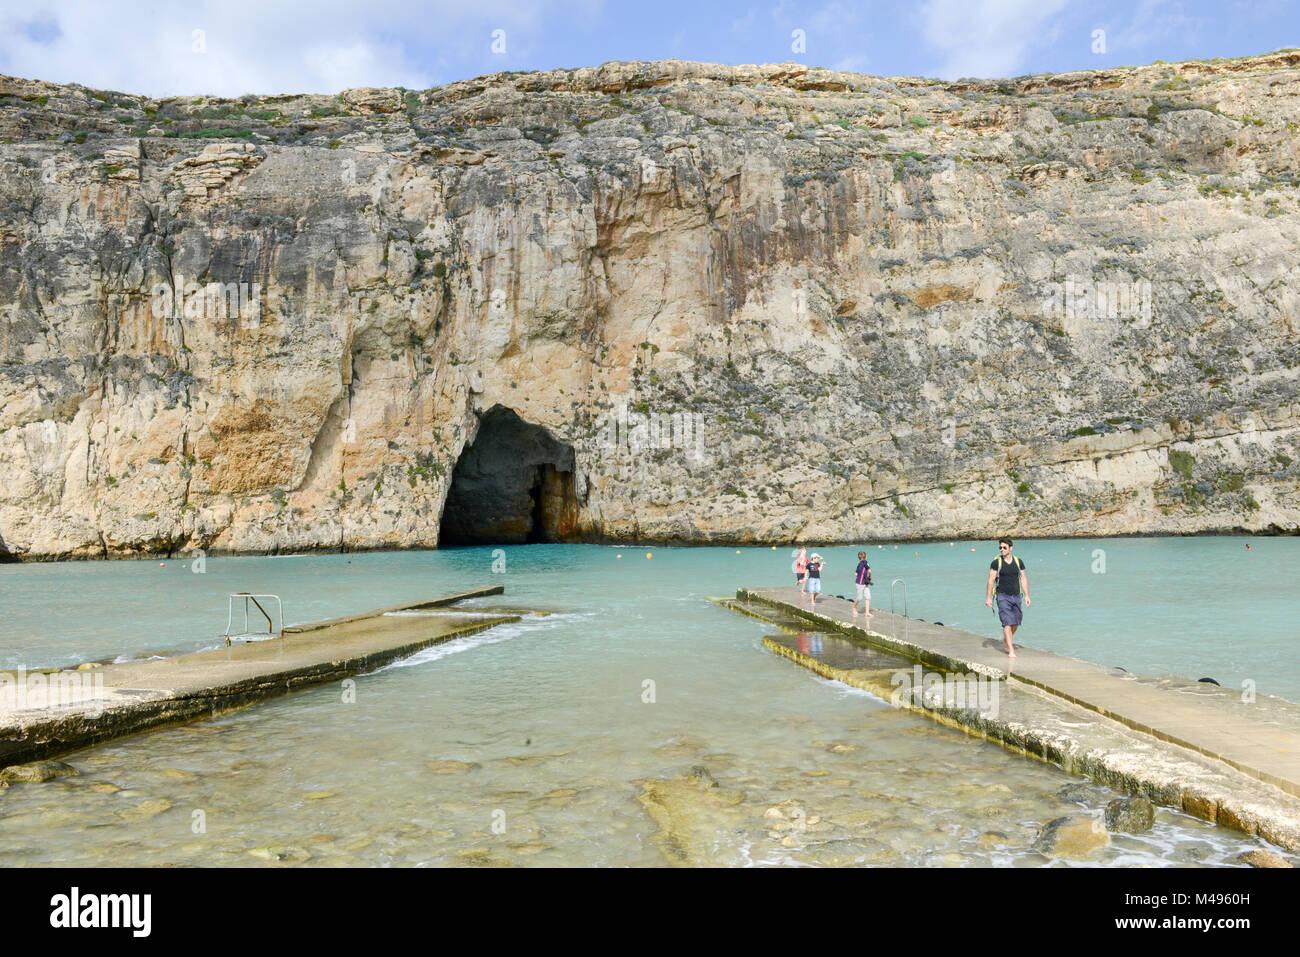 Gozo island, Malta - 30 October 2017: people walking on the pier of inland sea at Gozo Island, Malta. - Stock Image